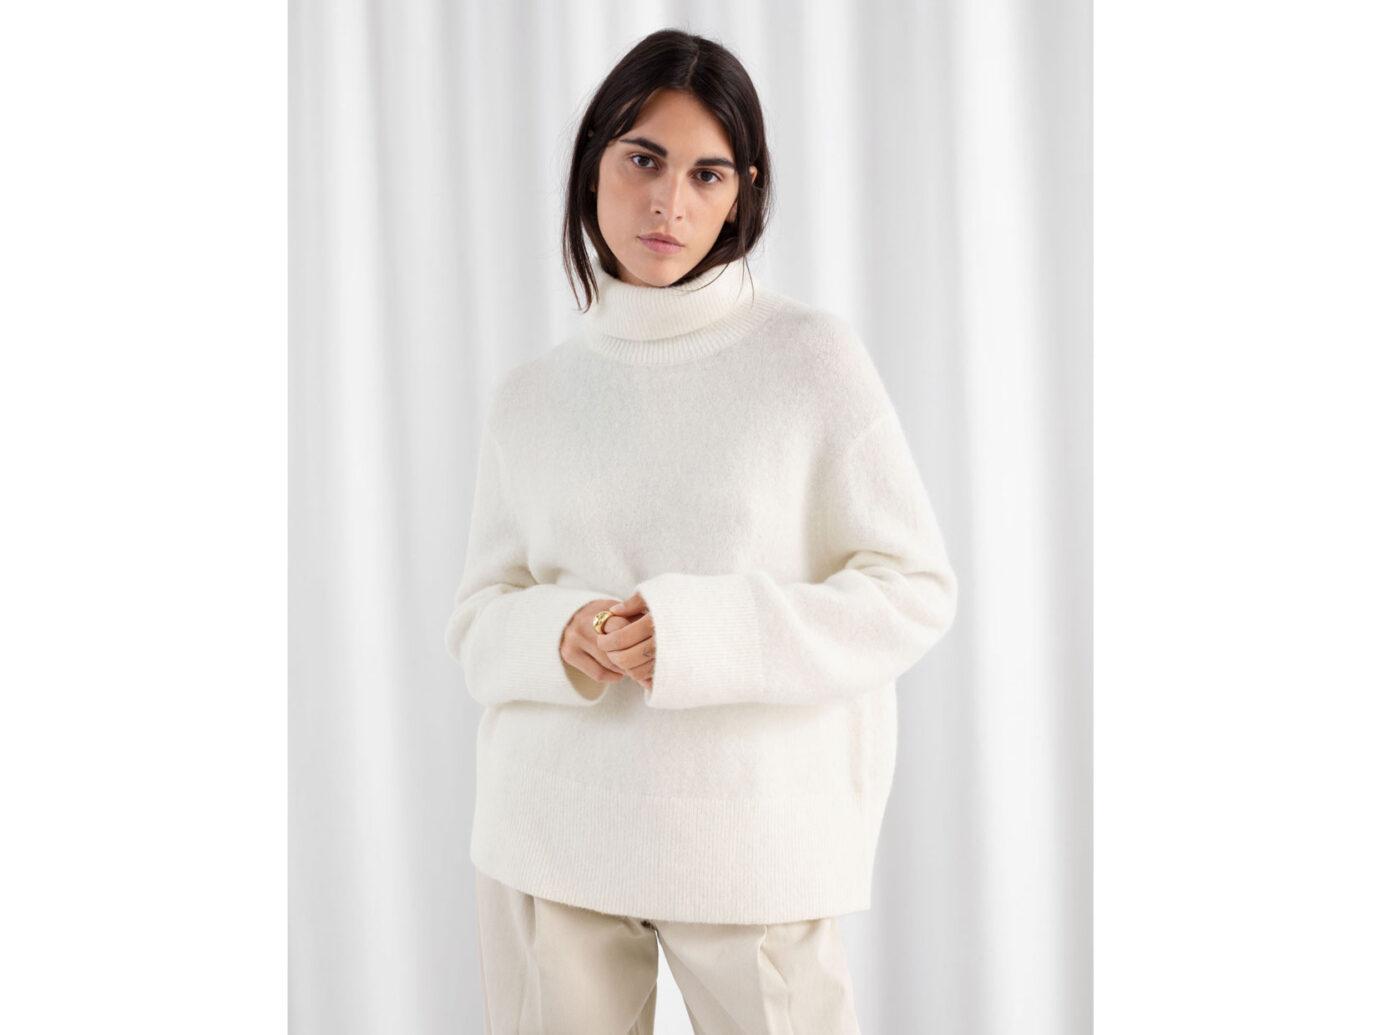 & Other Stories Alpaca Blend Turtleneck Sweater